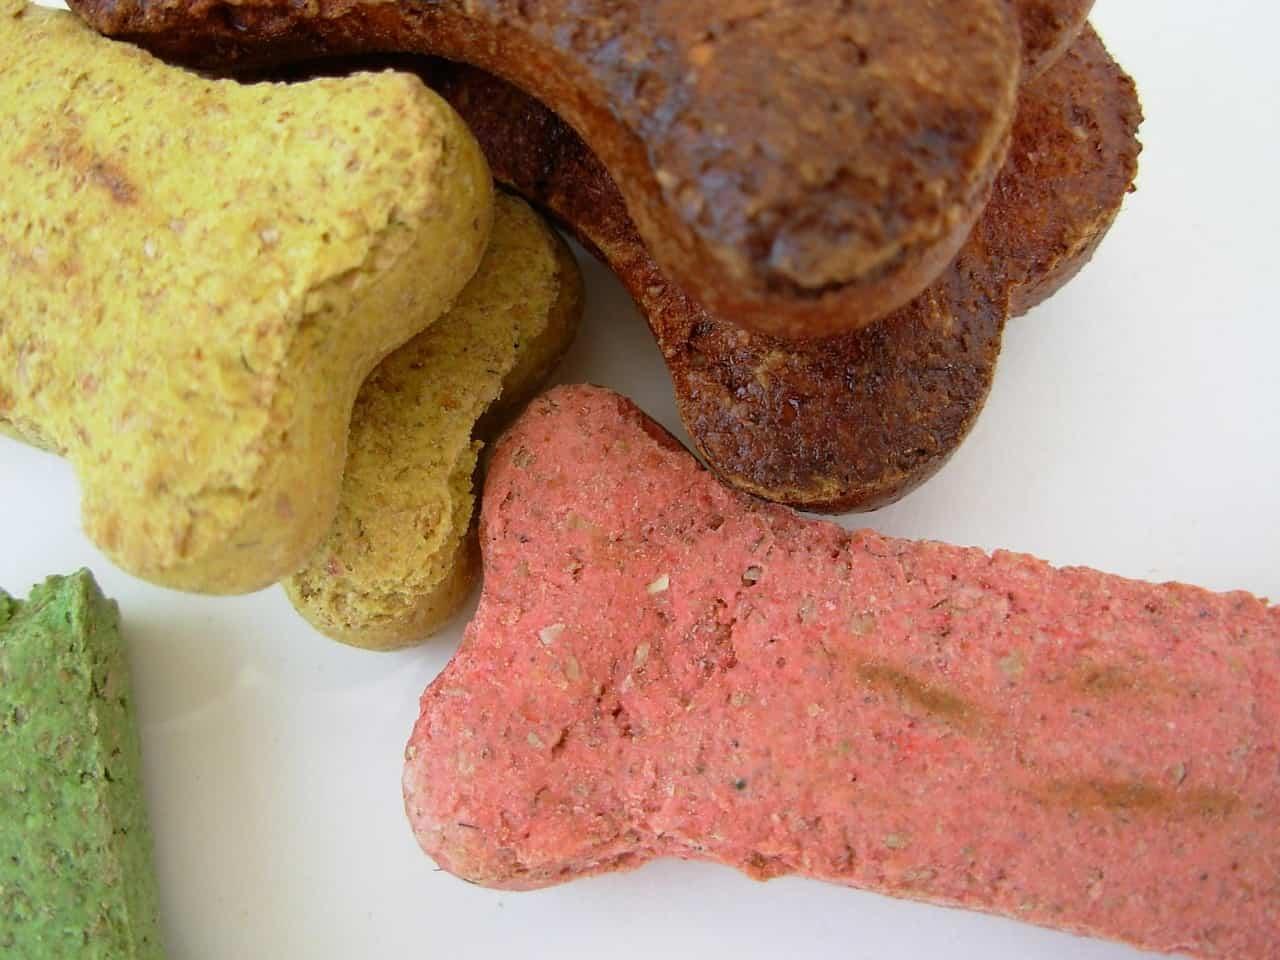 Best Homemade Dog Treat Recipes